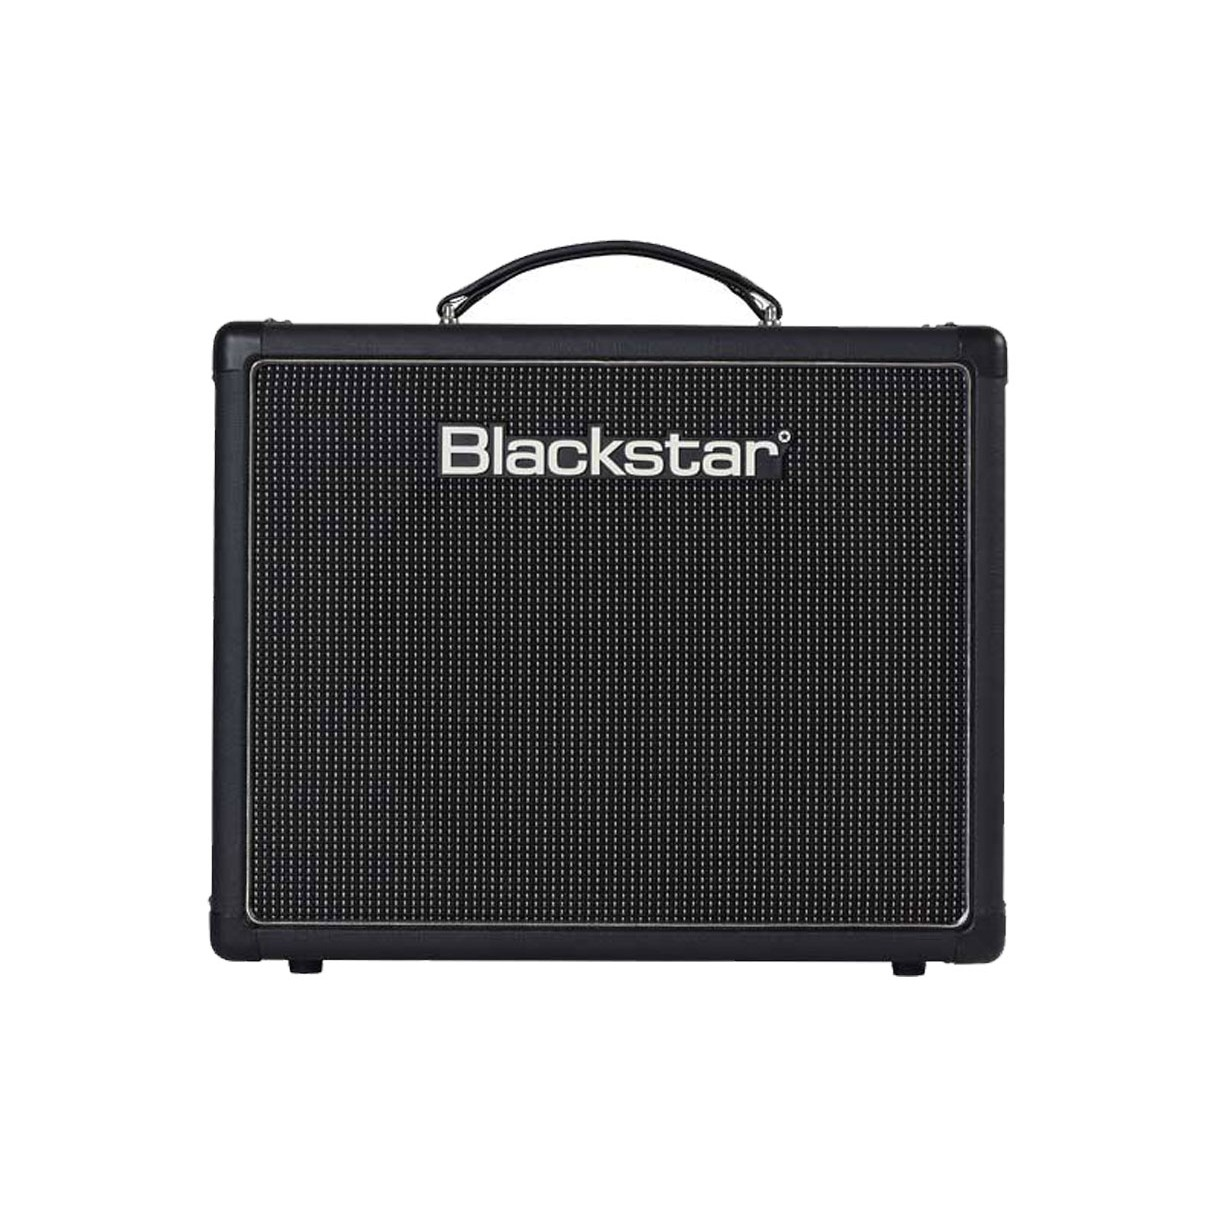 blackstar ht5r mkii 5 watt 1x12 tube combo w reverb. Black Bedroom Furniture Sets. Home Design Ideas